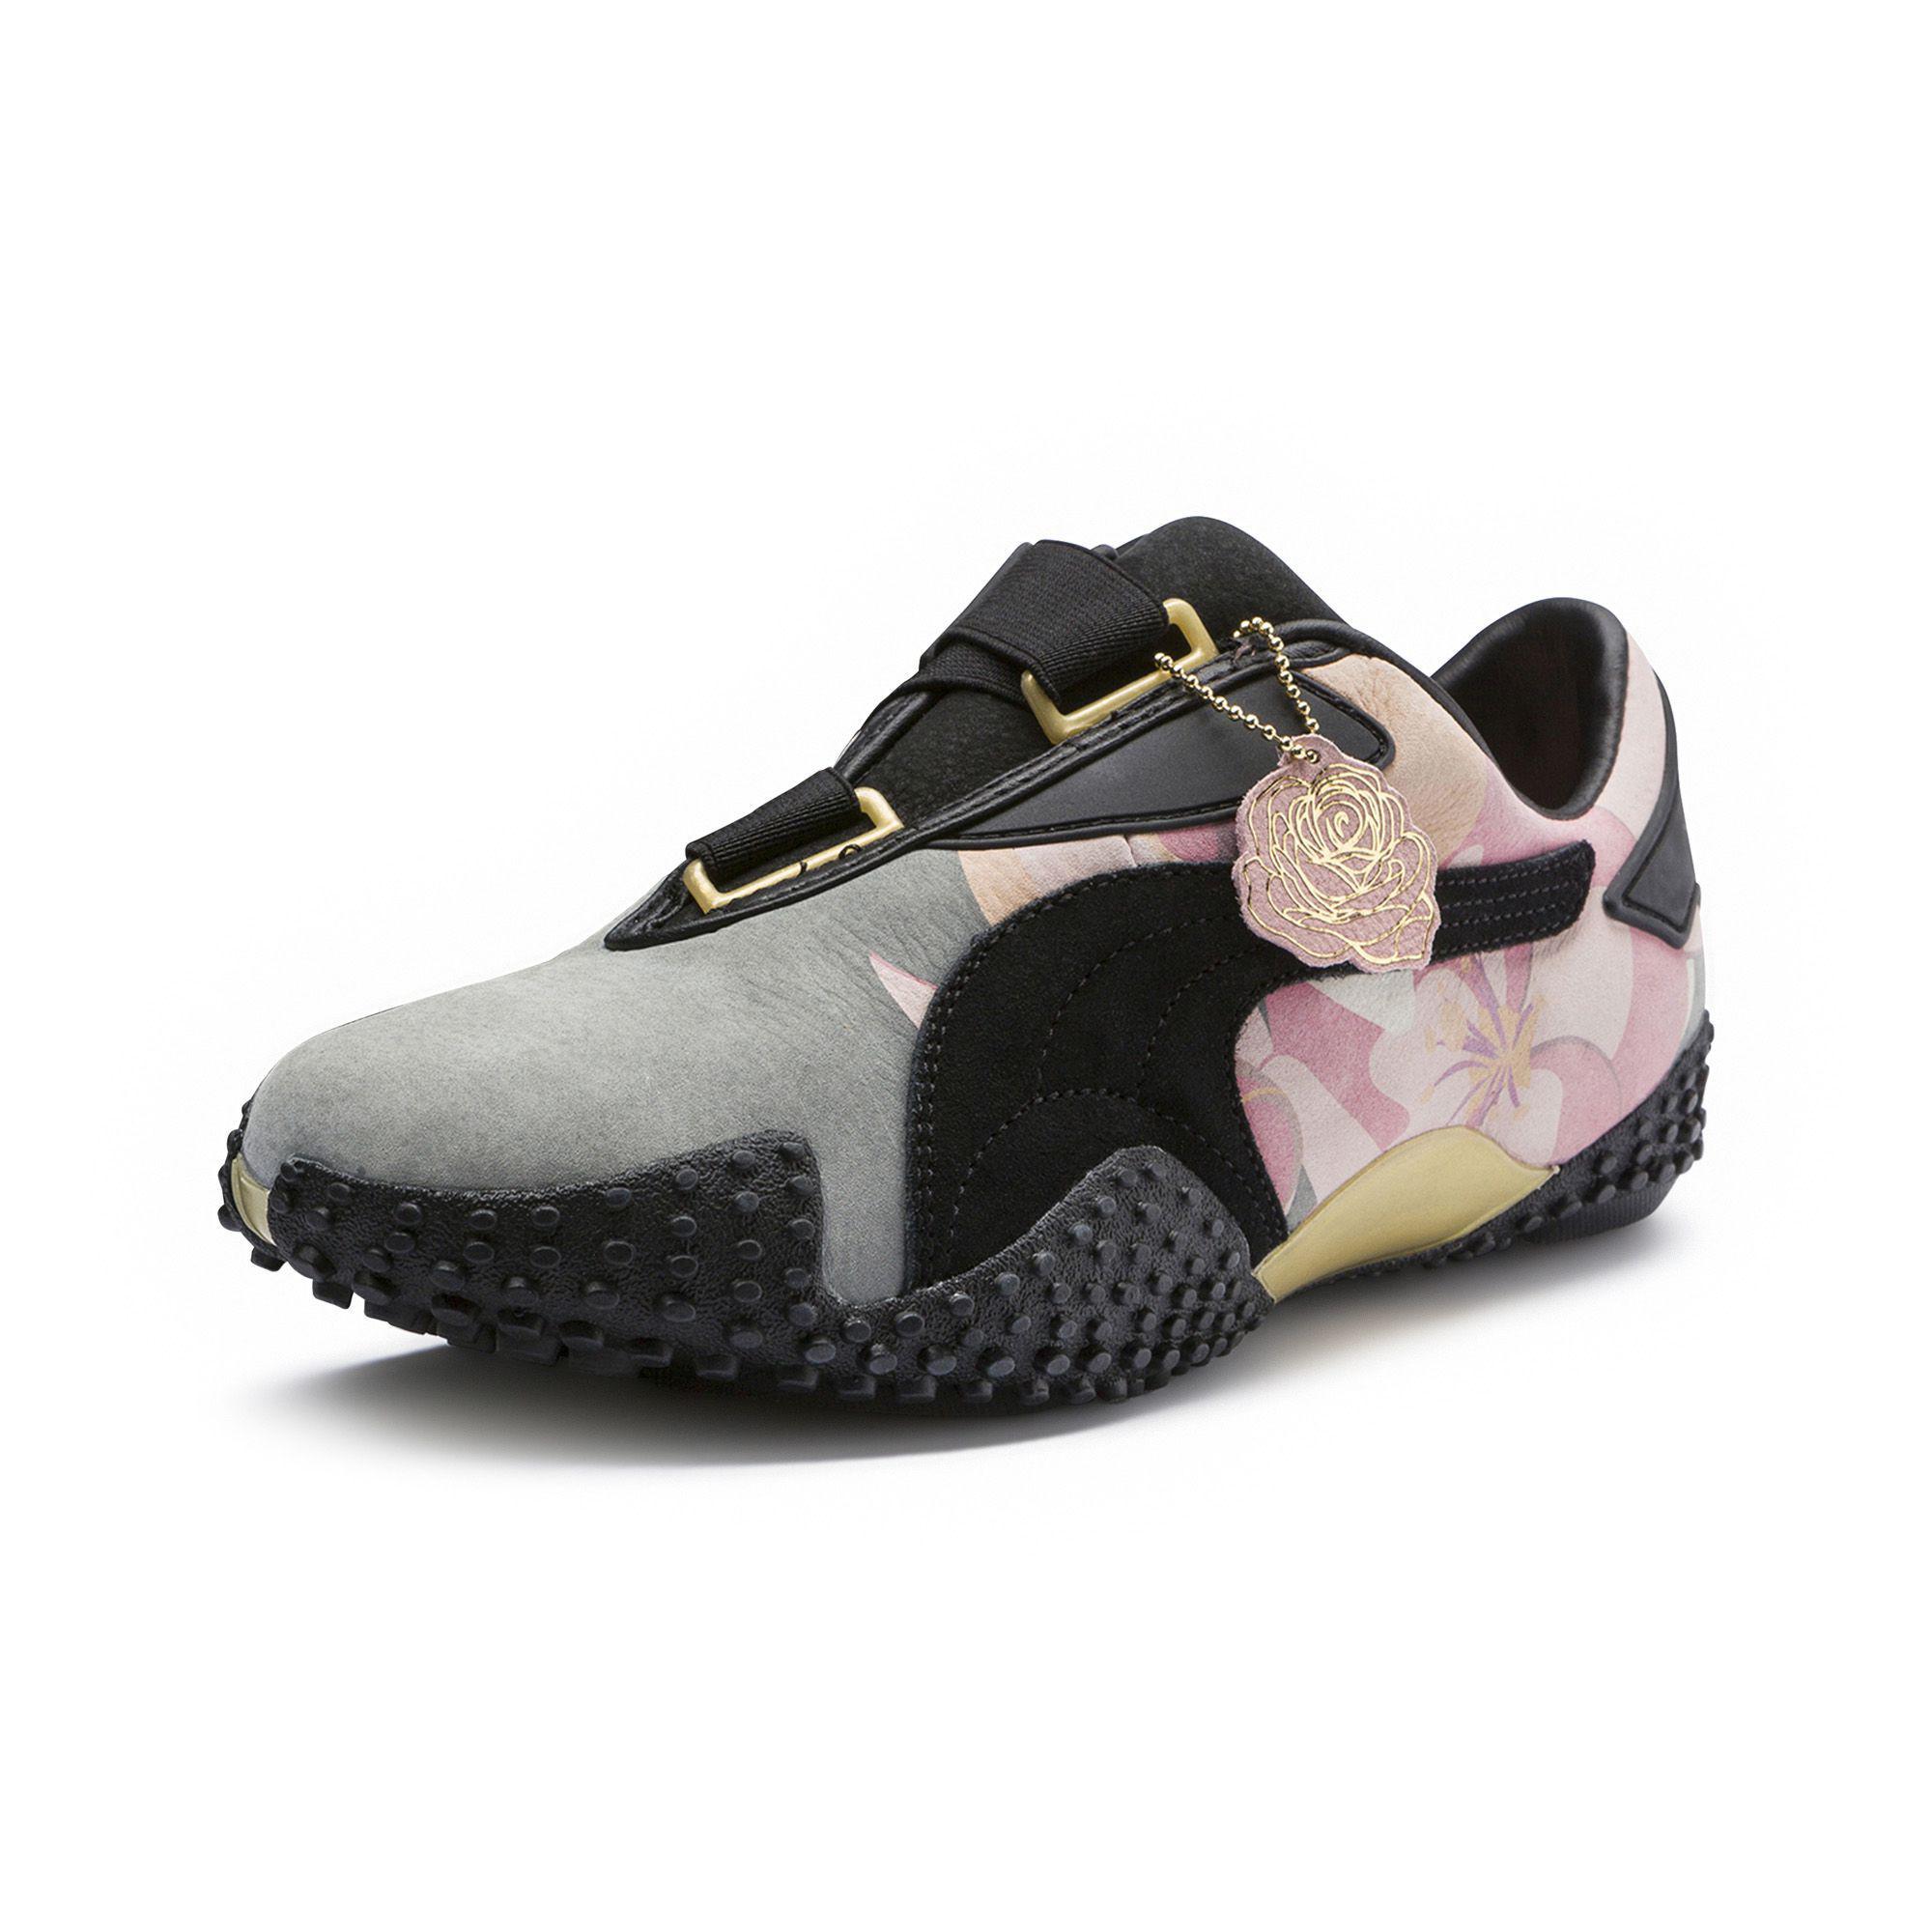 PUMA X Careaux Mostro Og Women's Sneakers in Black - Lyst